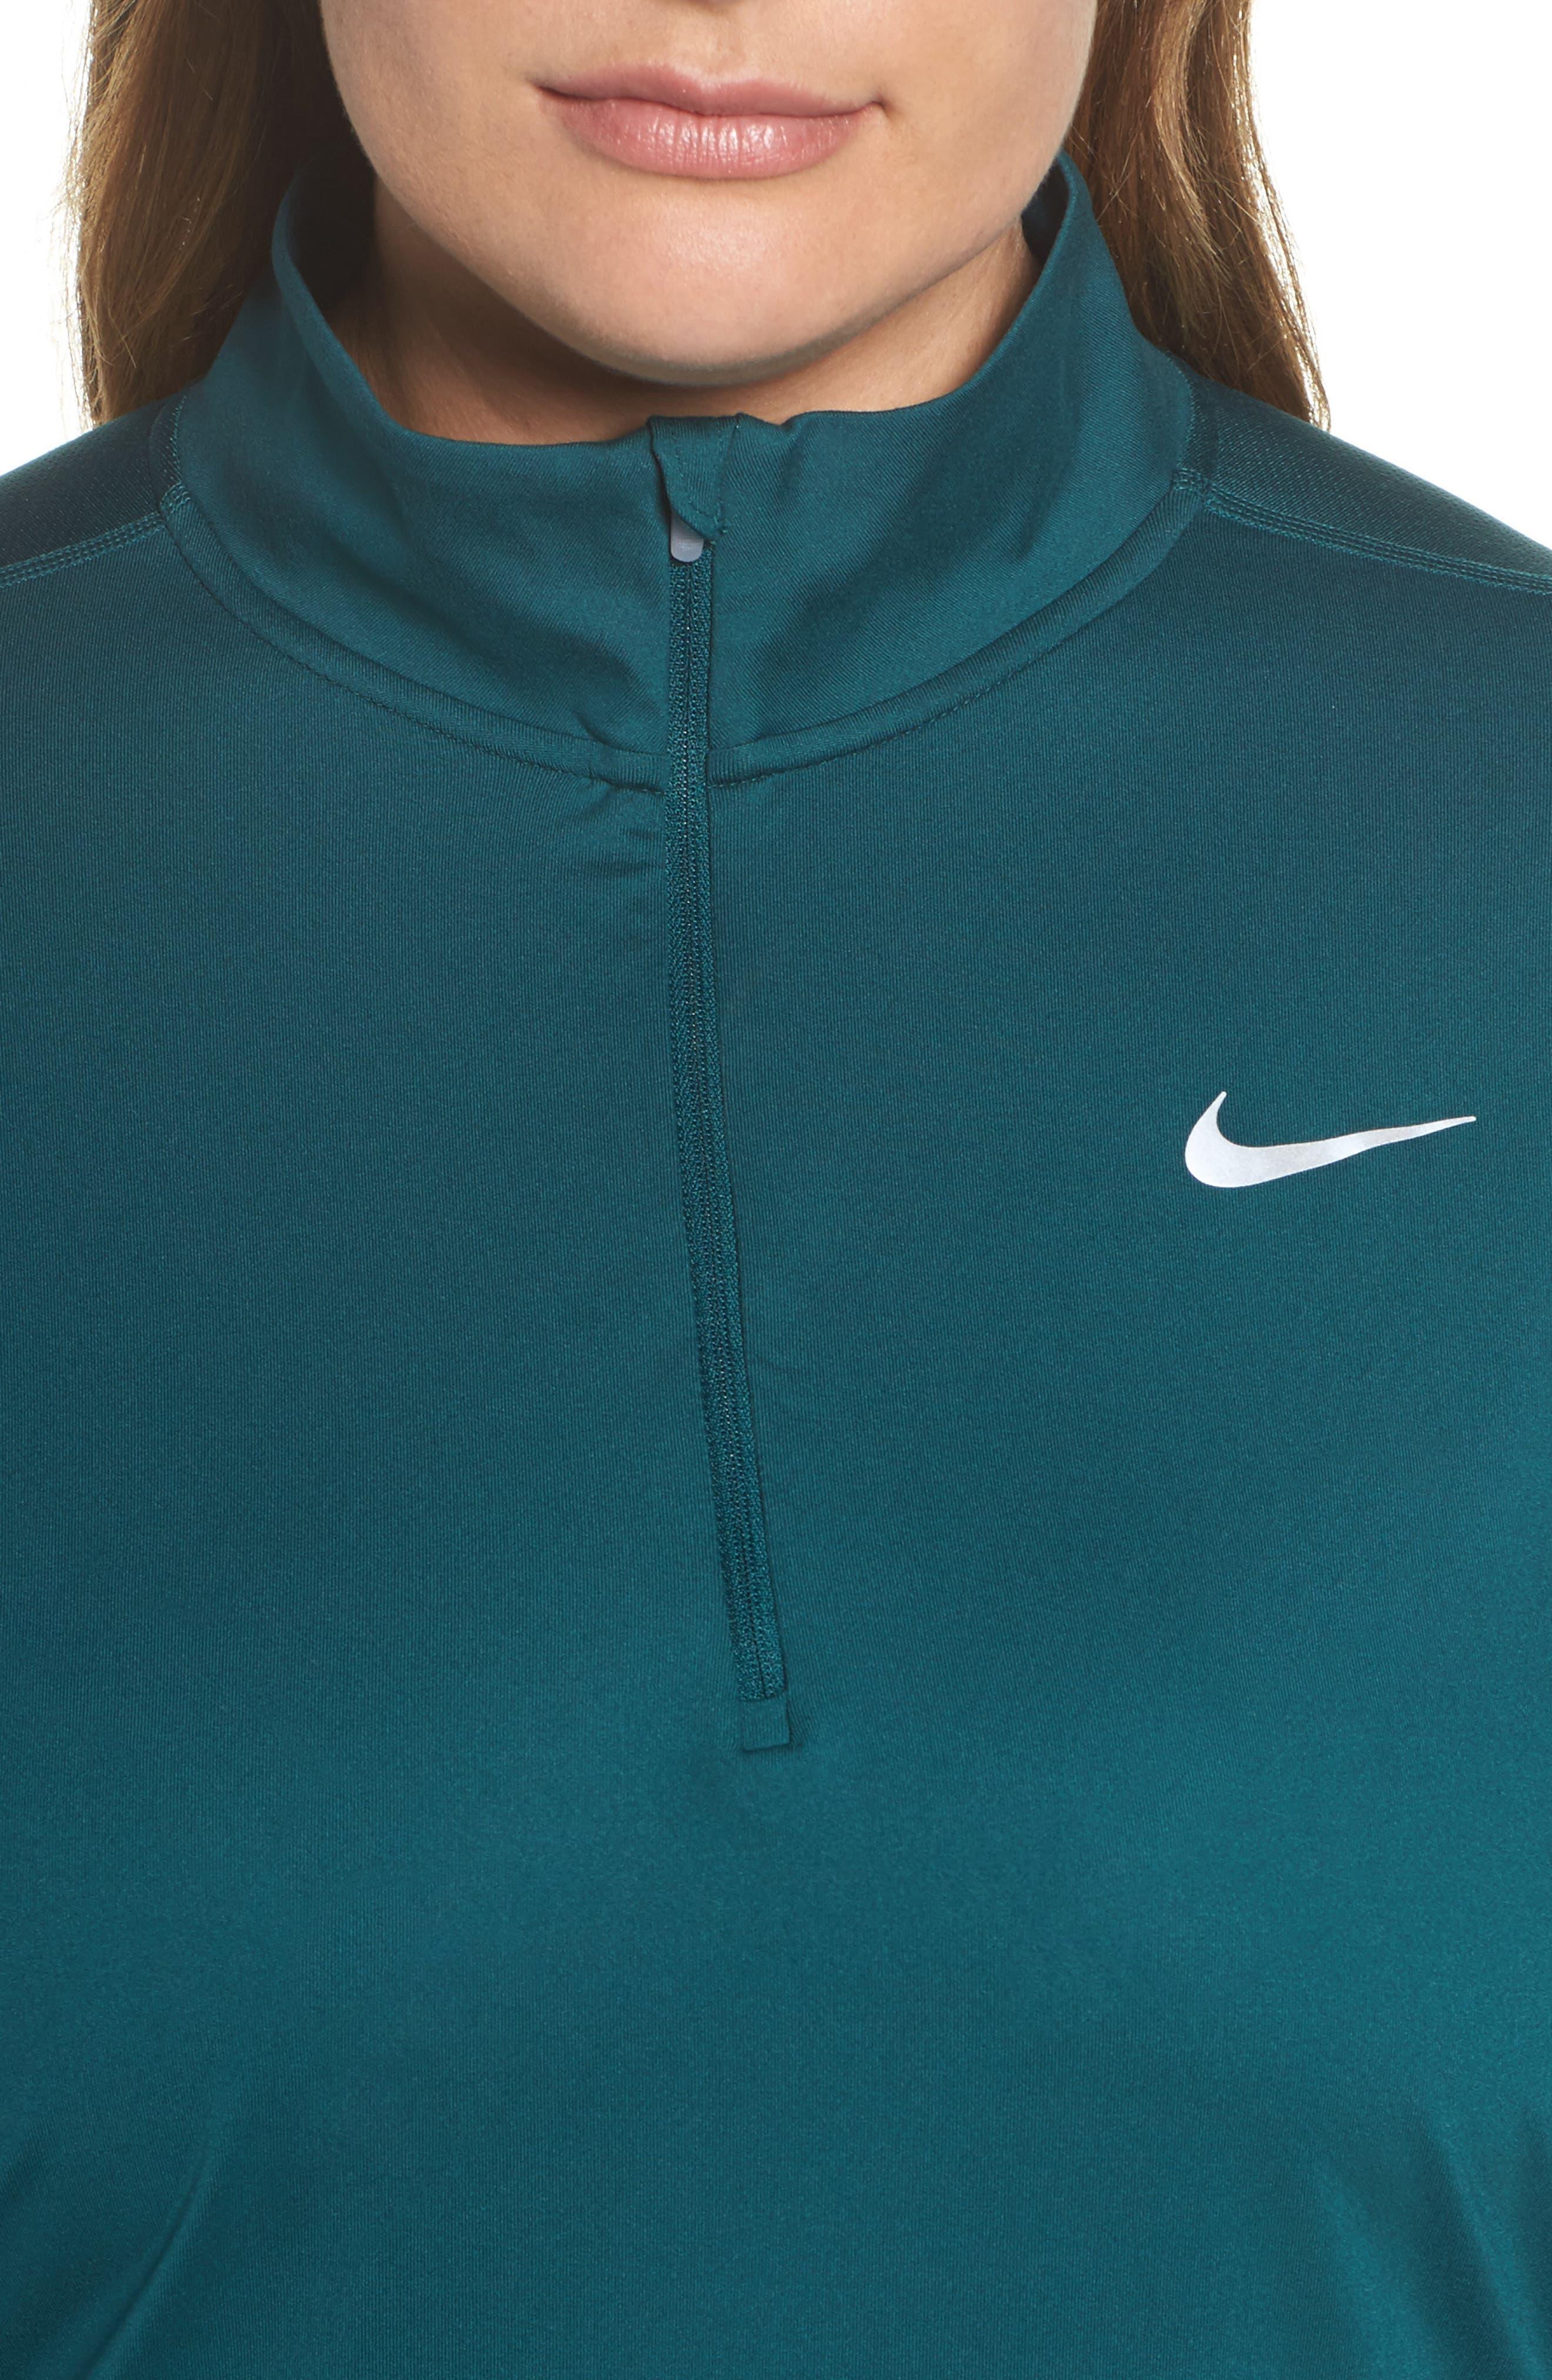 Alternate Image 3  - Nike Dry Element Half Zip Top (Plus Size)